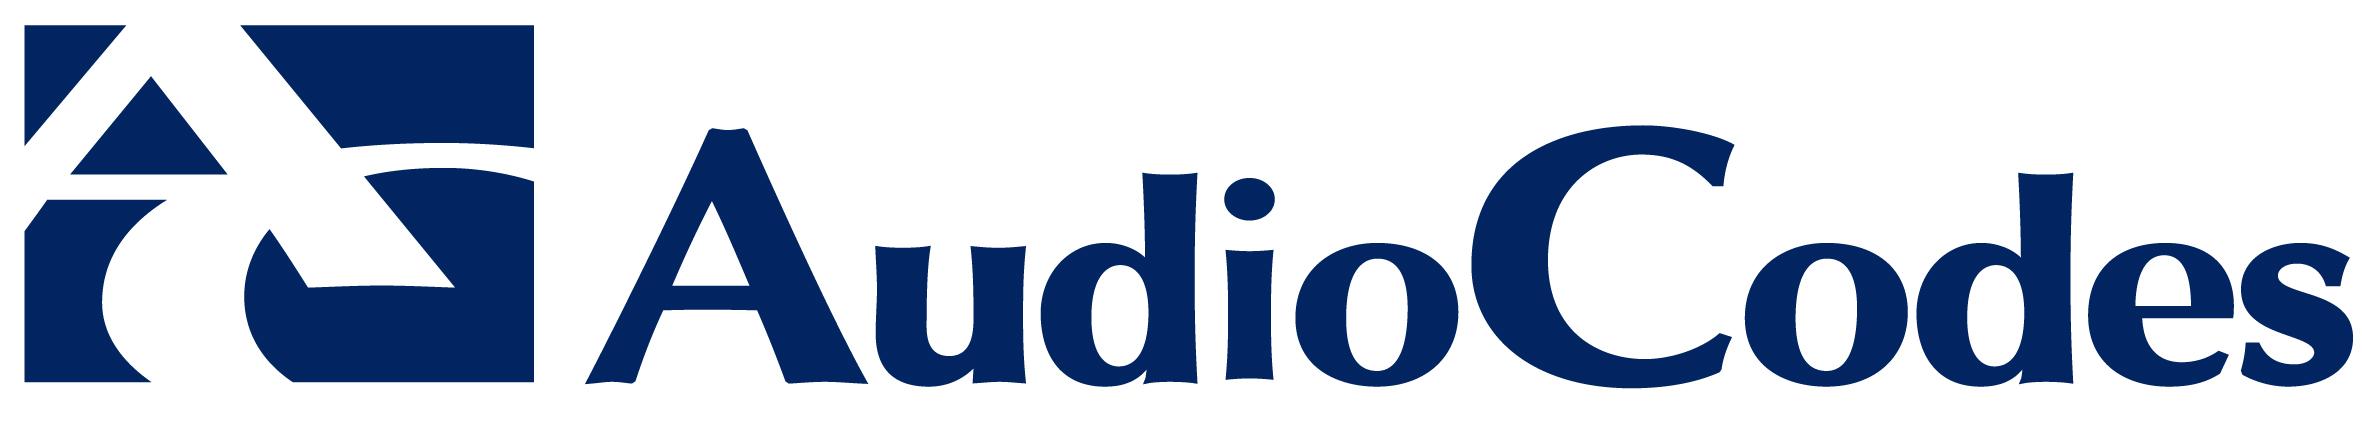 AudioCodes logo